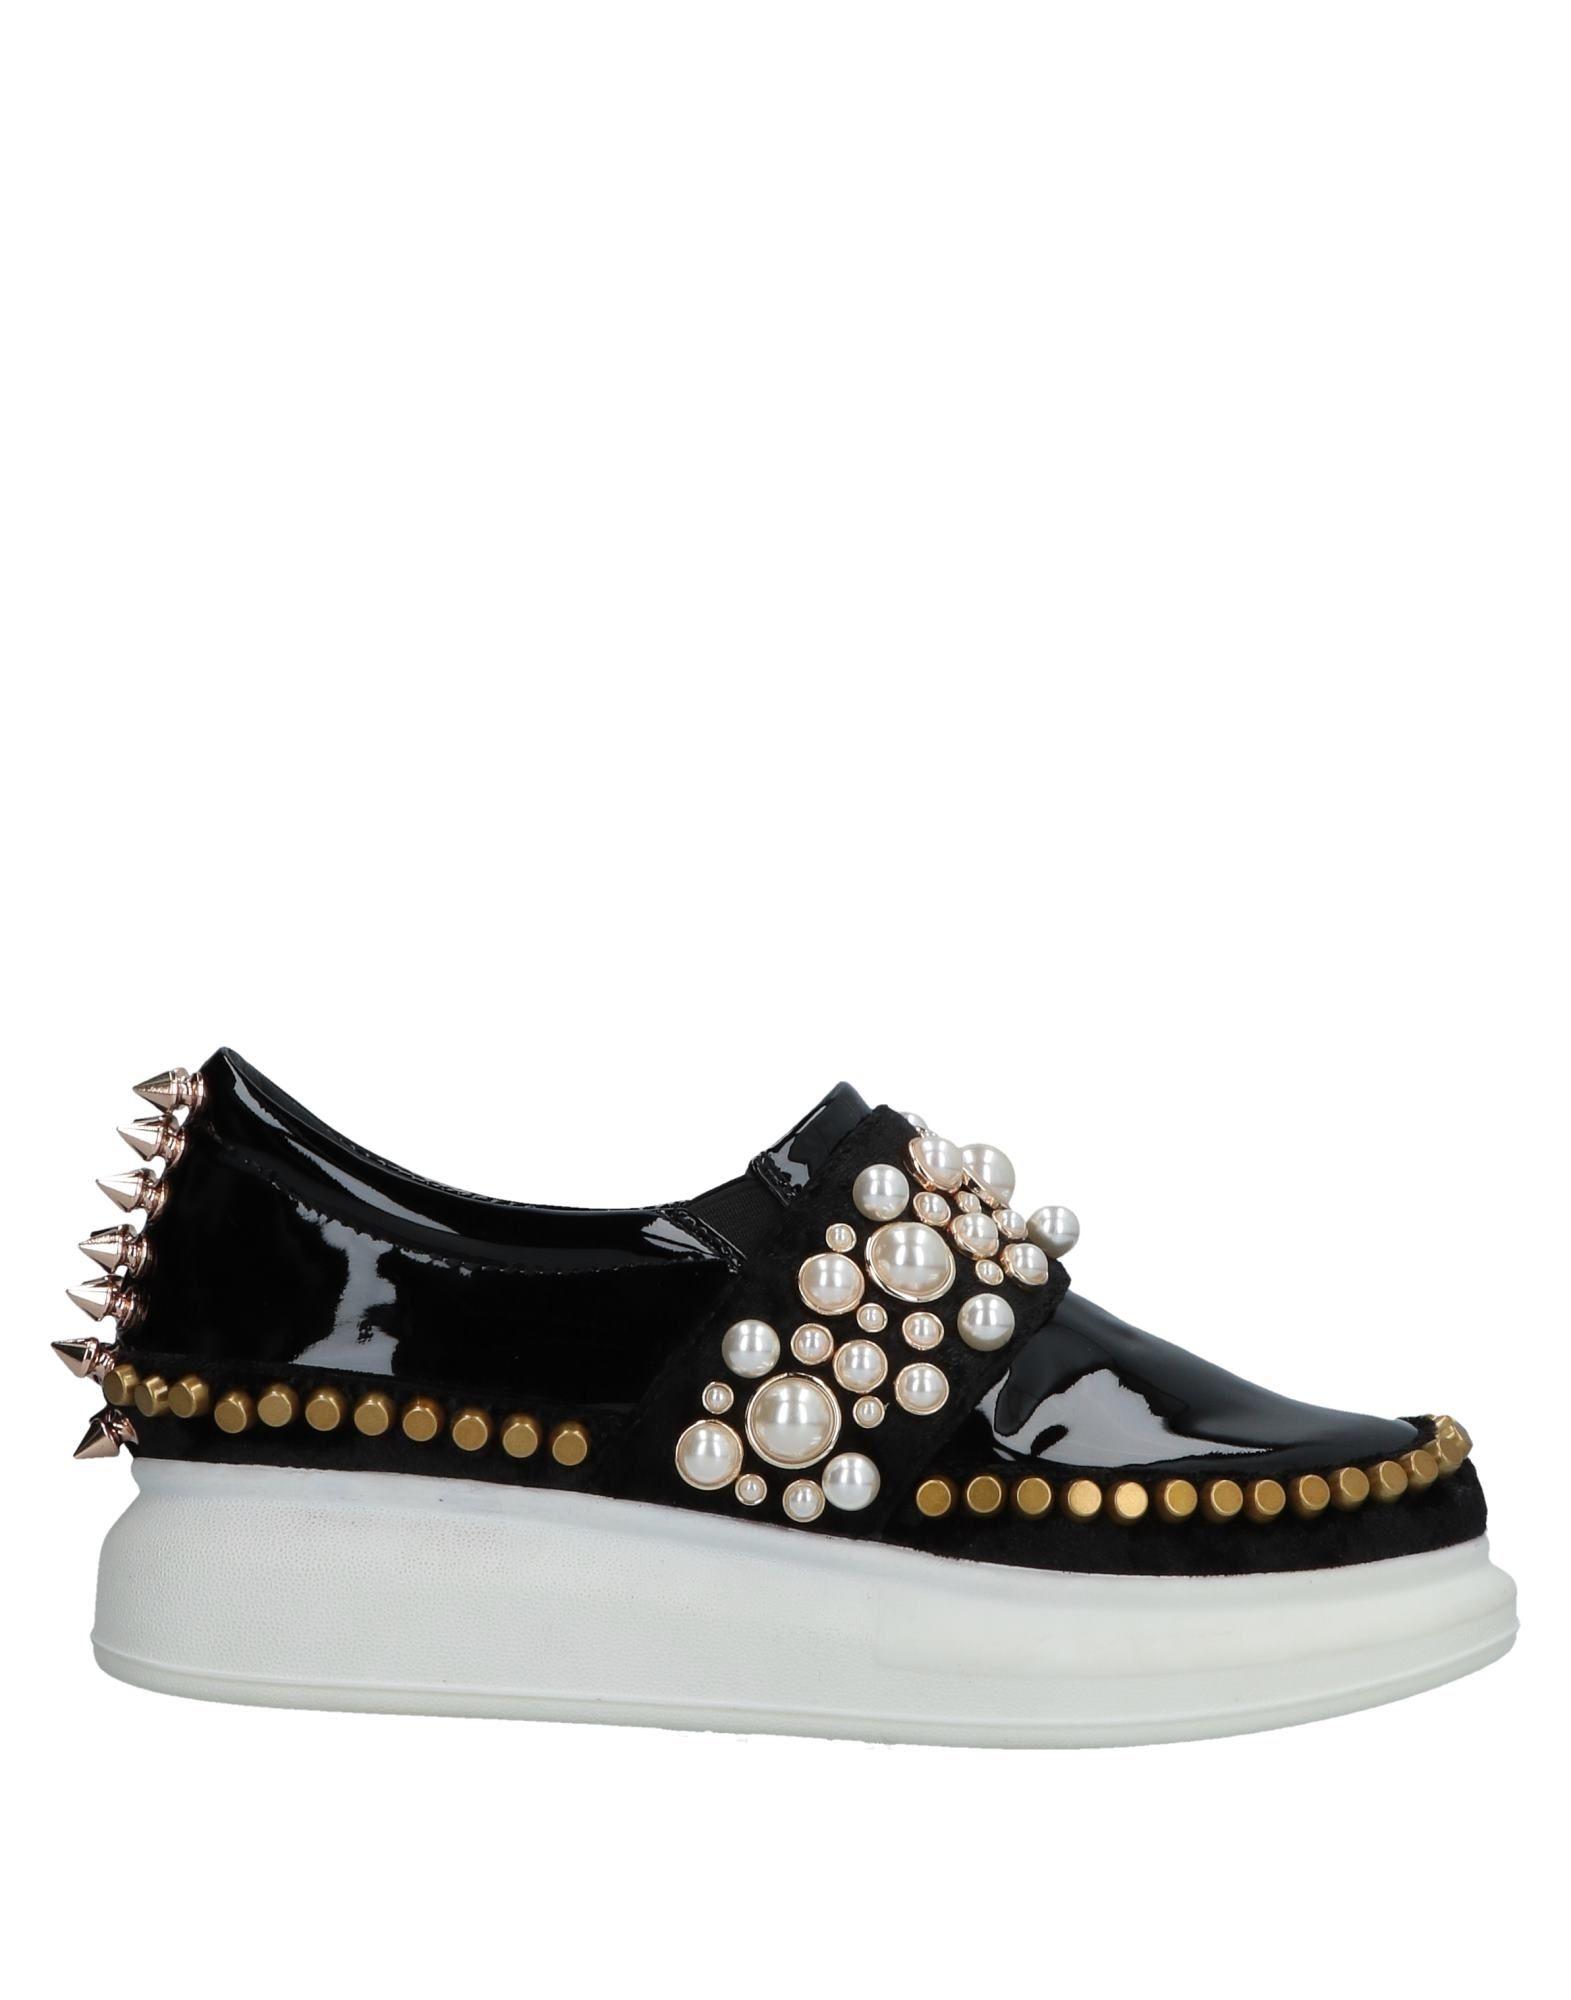 Jeffrey Campbell Sneakers Sneakers - Women Jeffrey Campbell Sneakers Sneakers online on  Australia - 11578361HF 3c3b6c